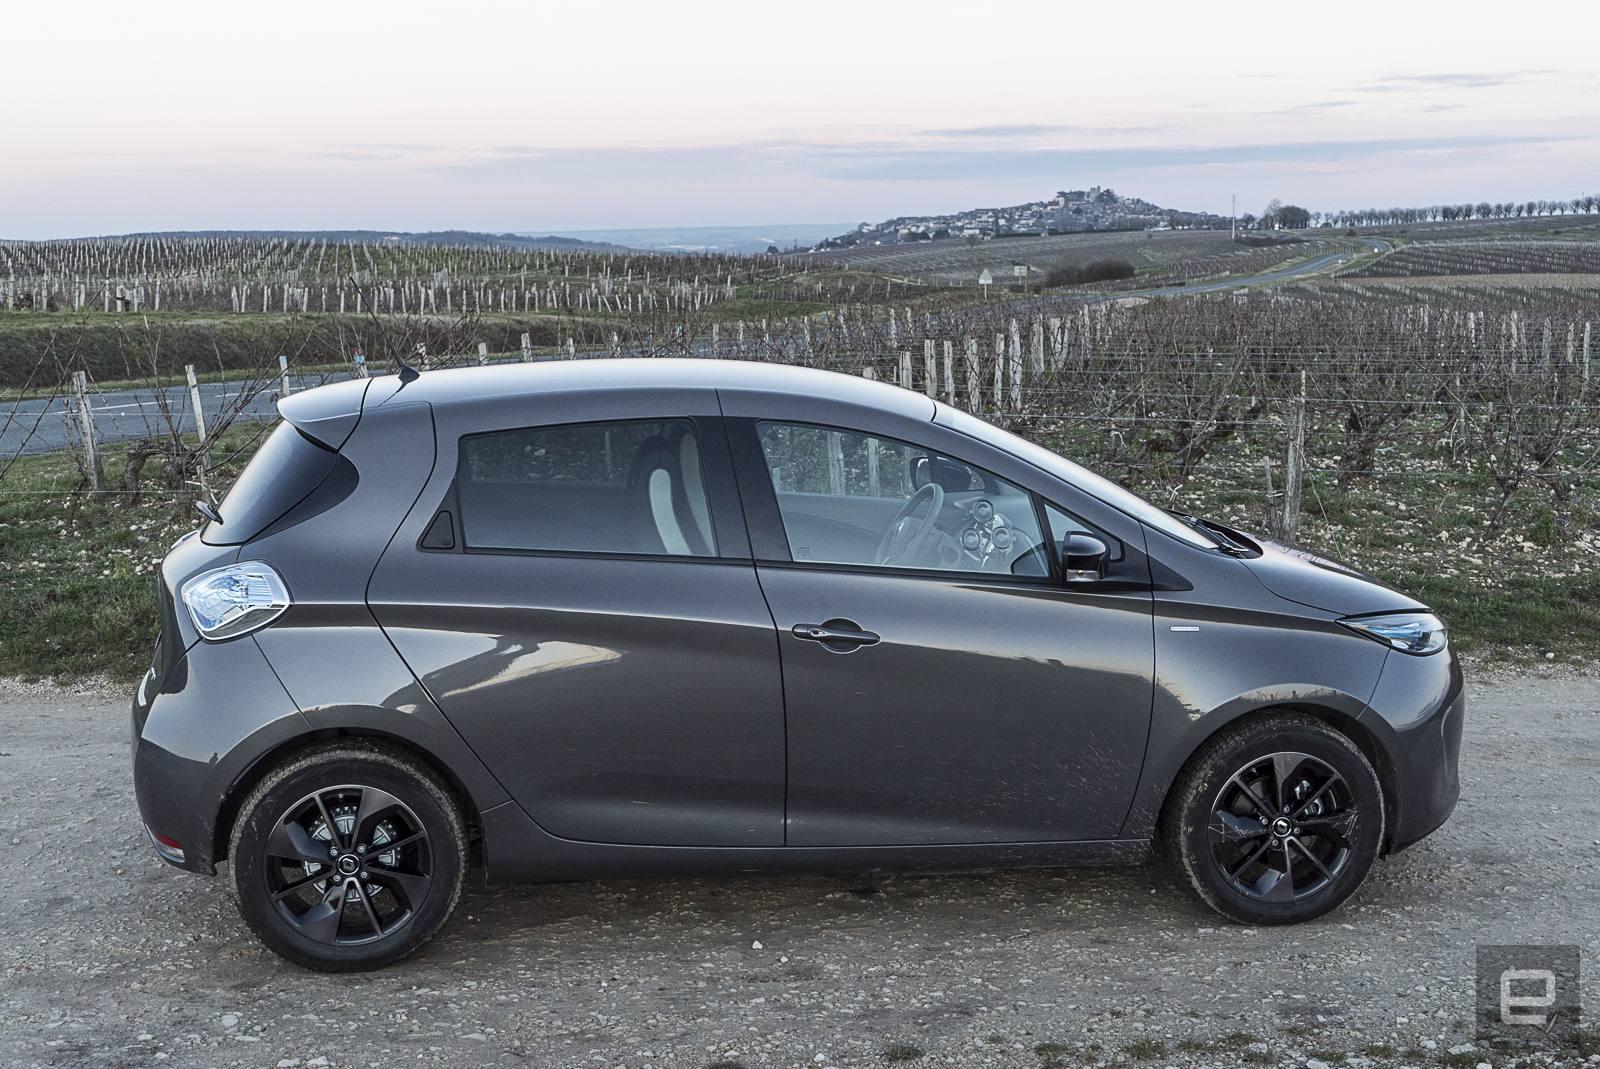 Renault-Zoe-25.jpg